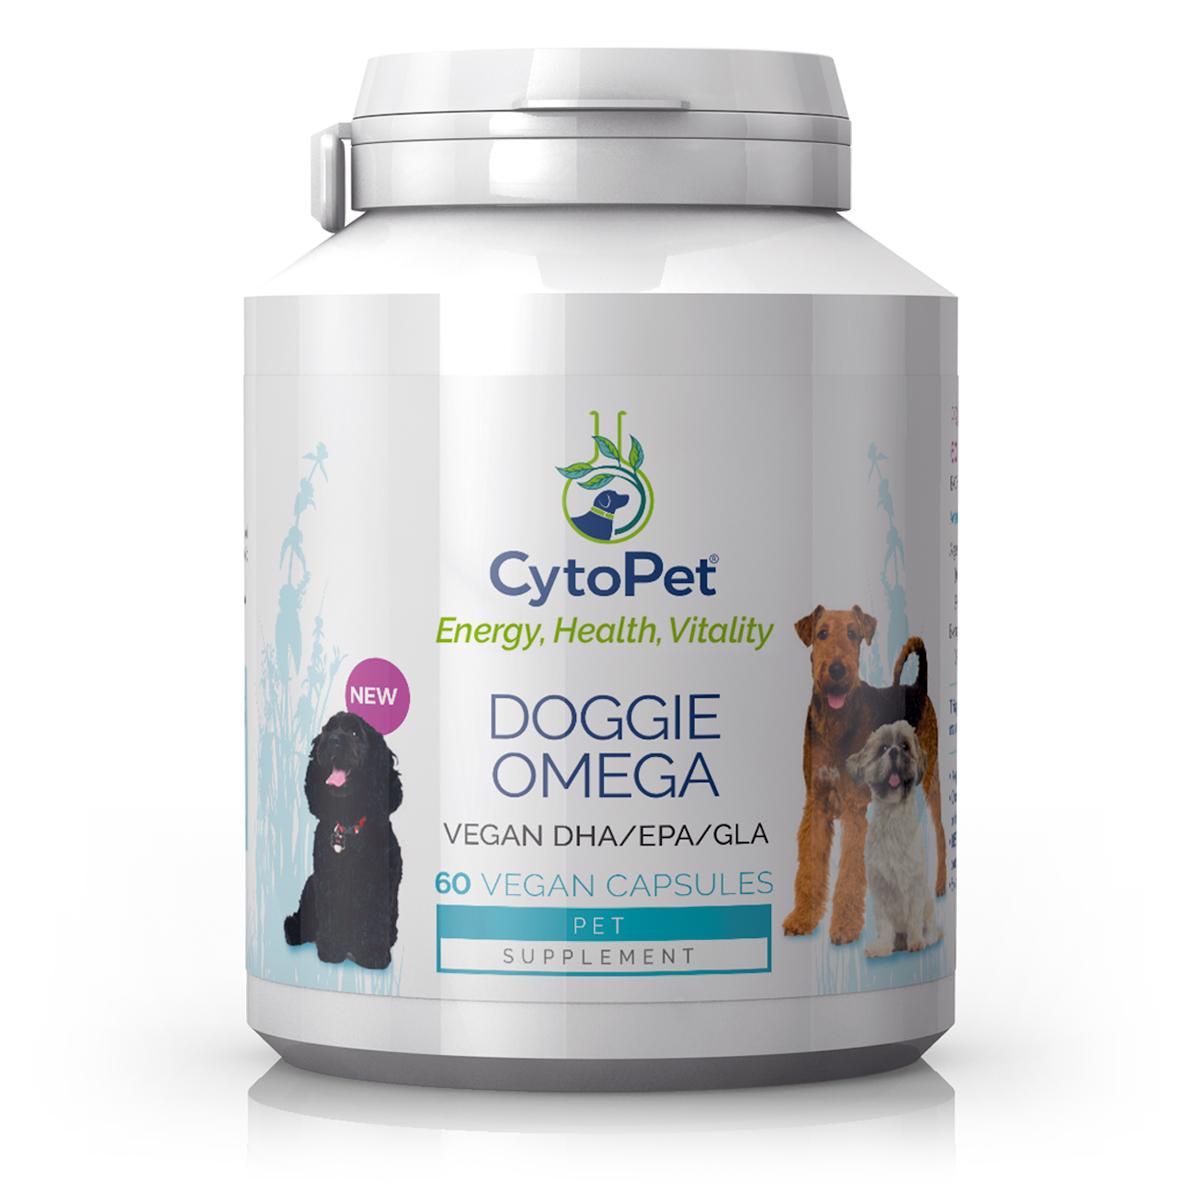 CytoPet Doggie Omega 60's